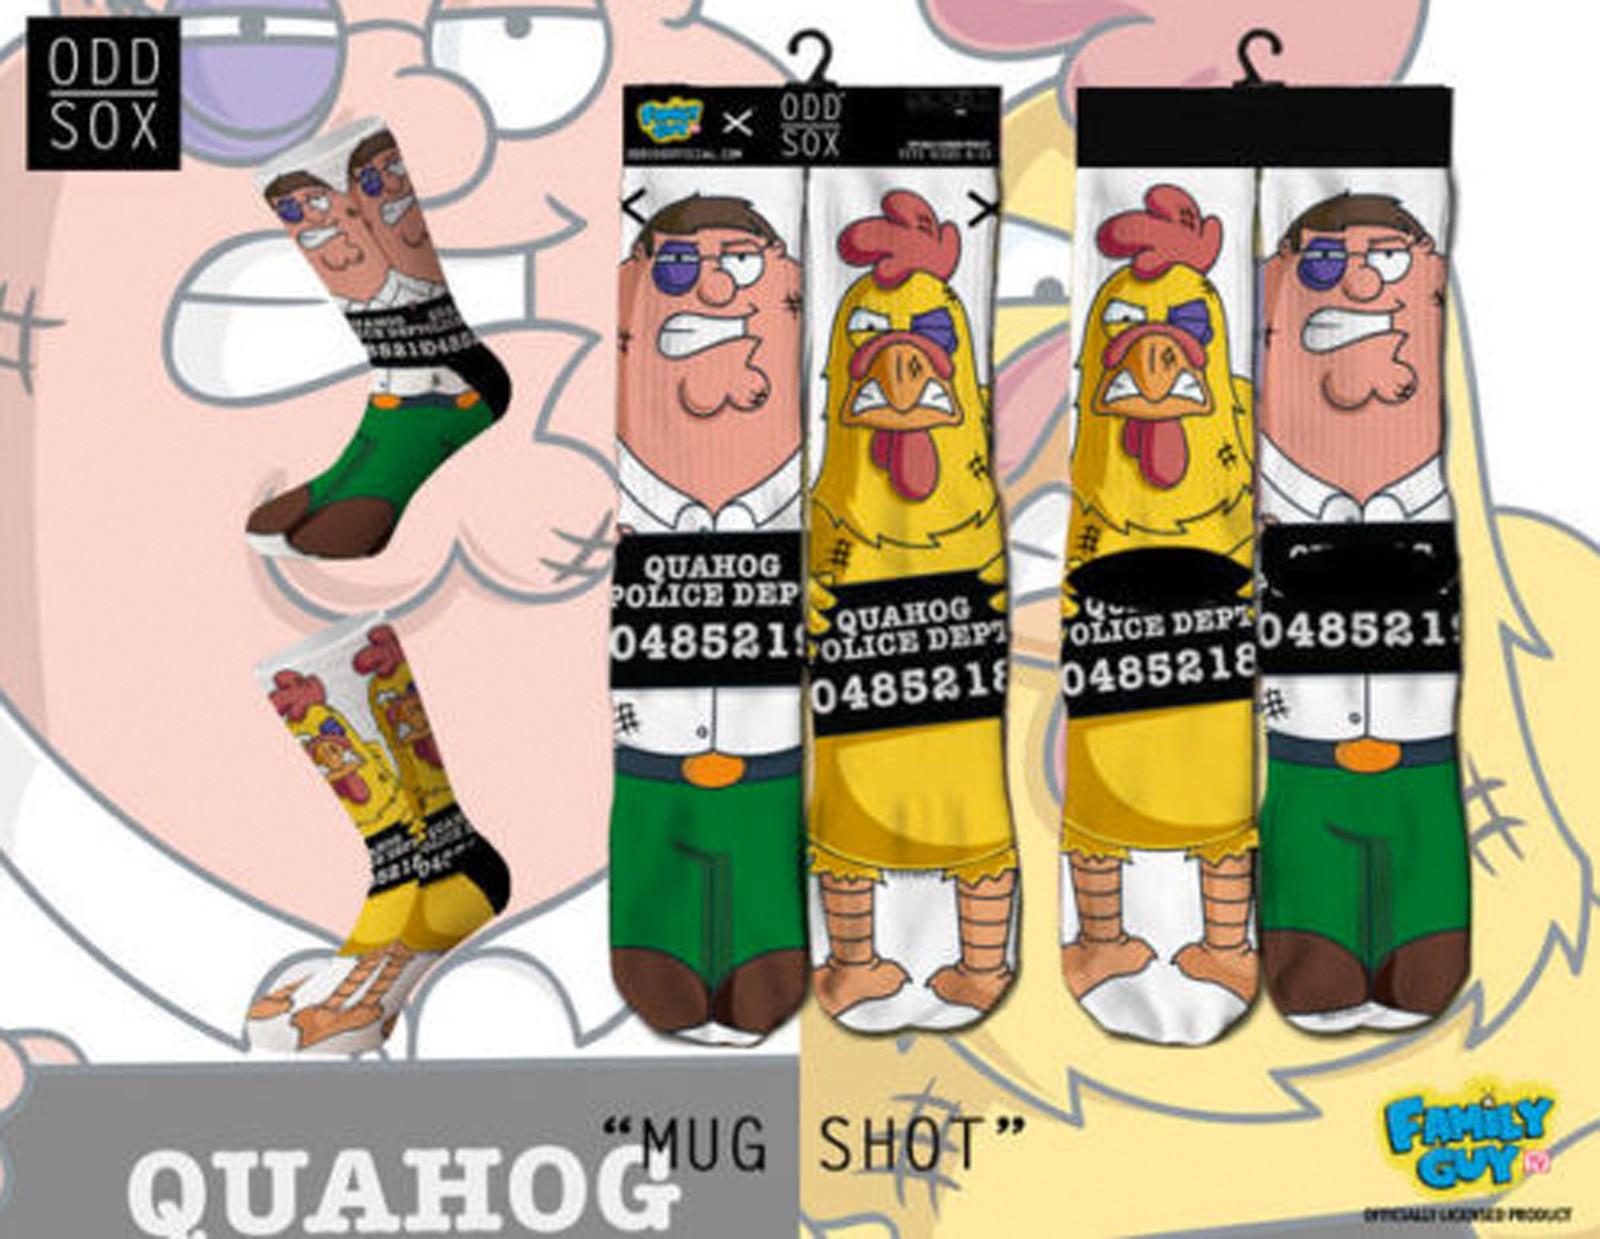 ODD Sox - Family Guy Edition Mug Shots Socken